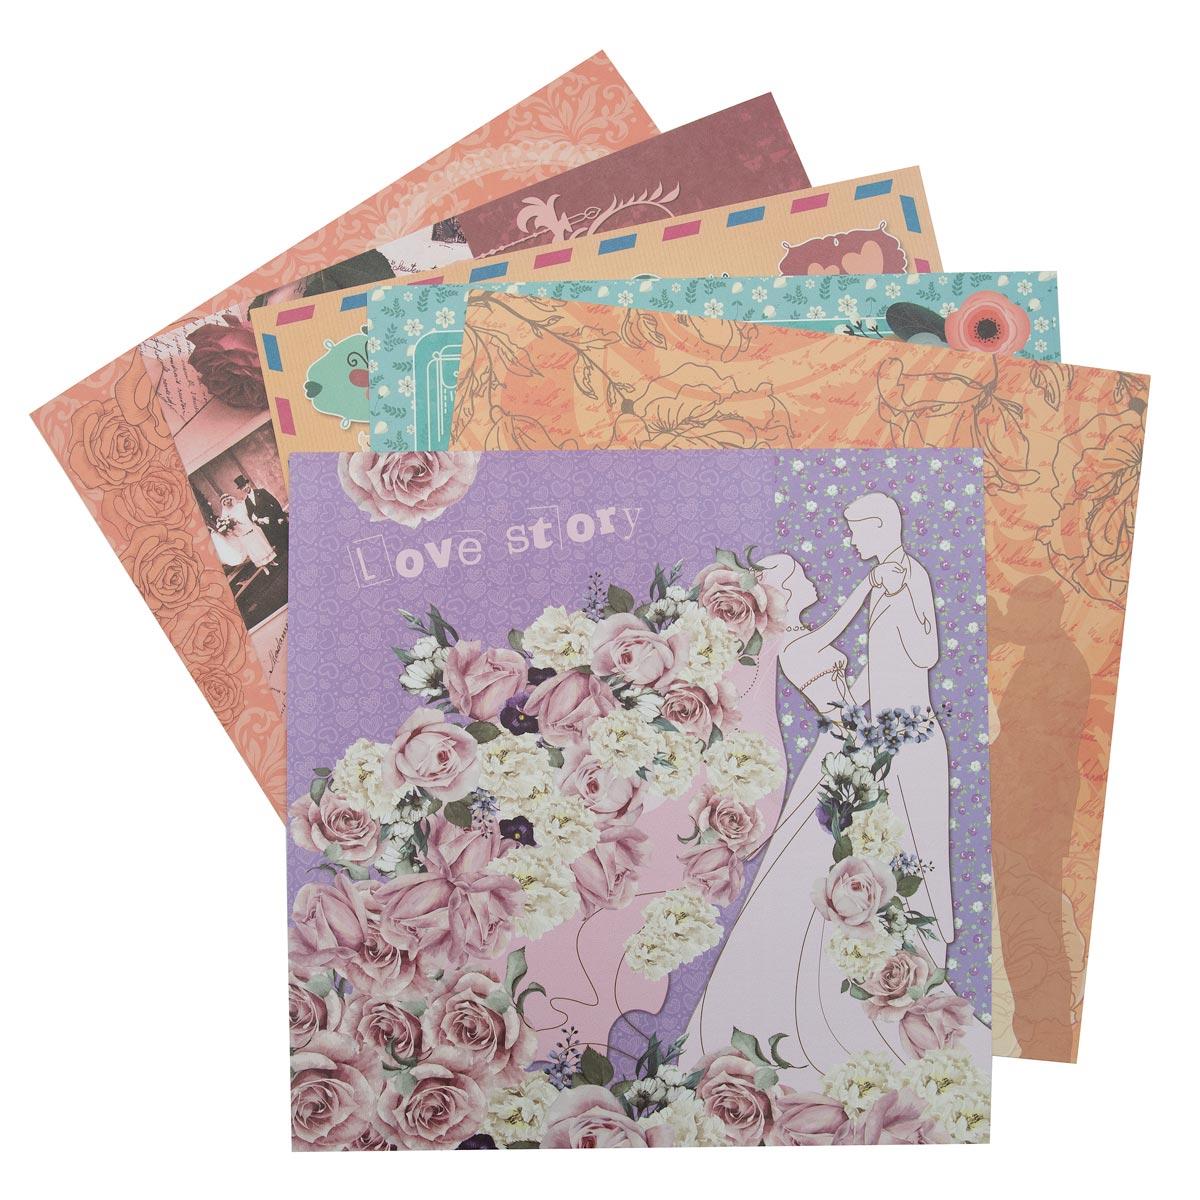 С2782-06 Цветная бумага для скрапбукинга. 12л. 30x30 'Свадебная фантазия'